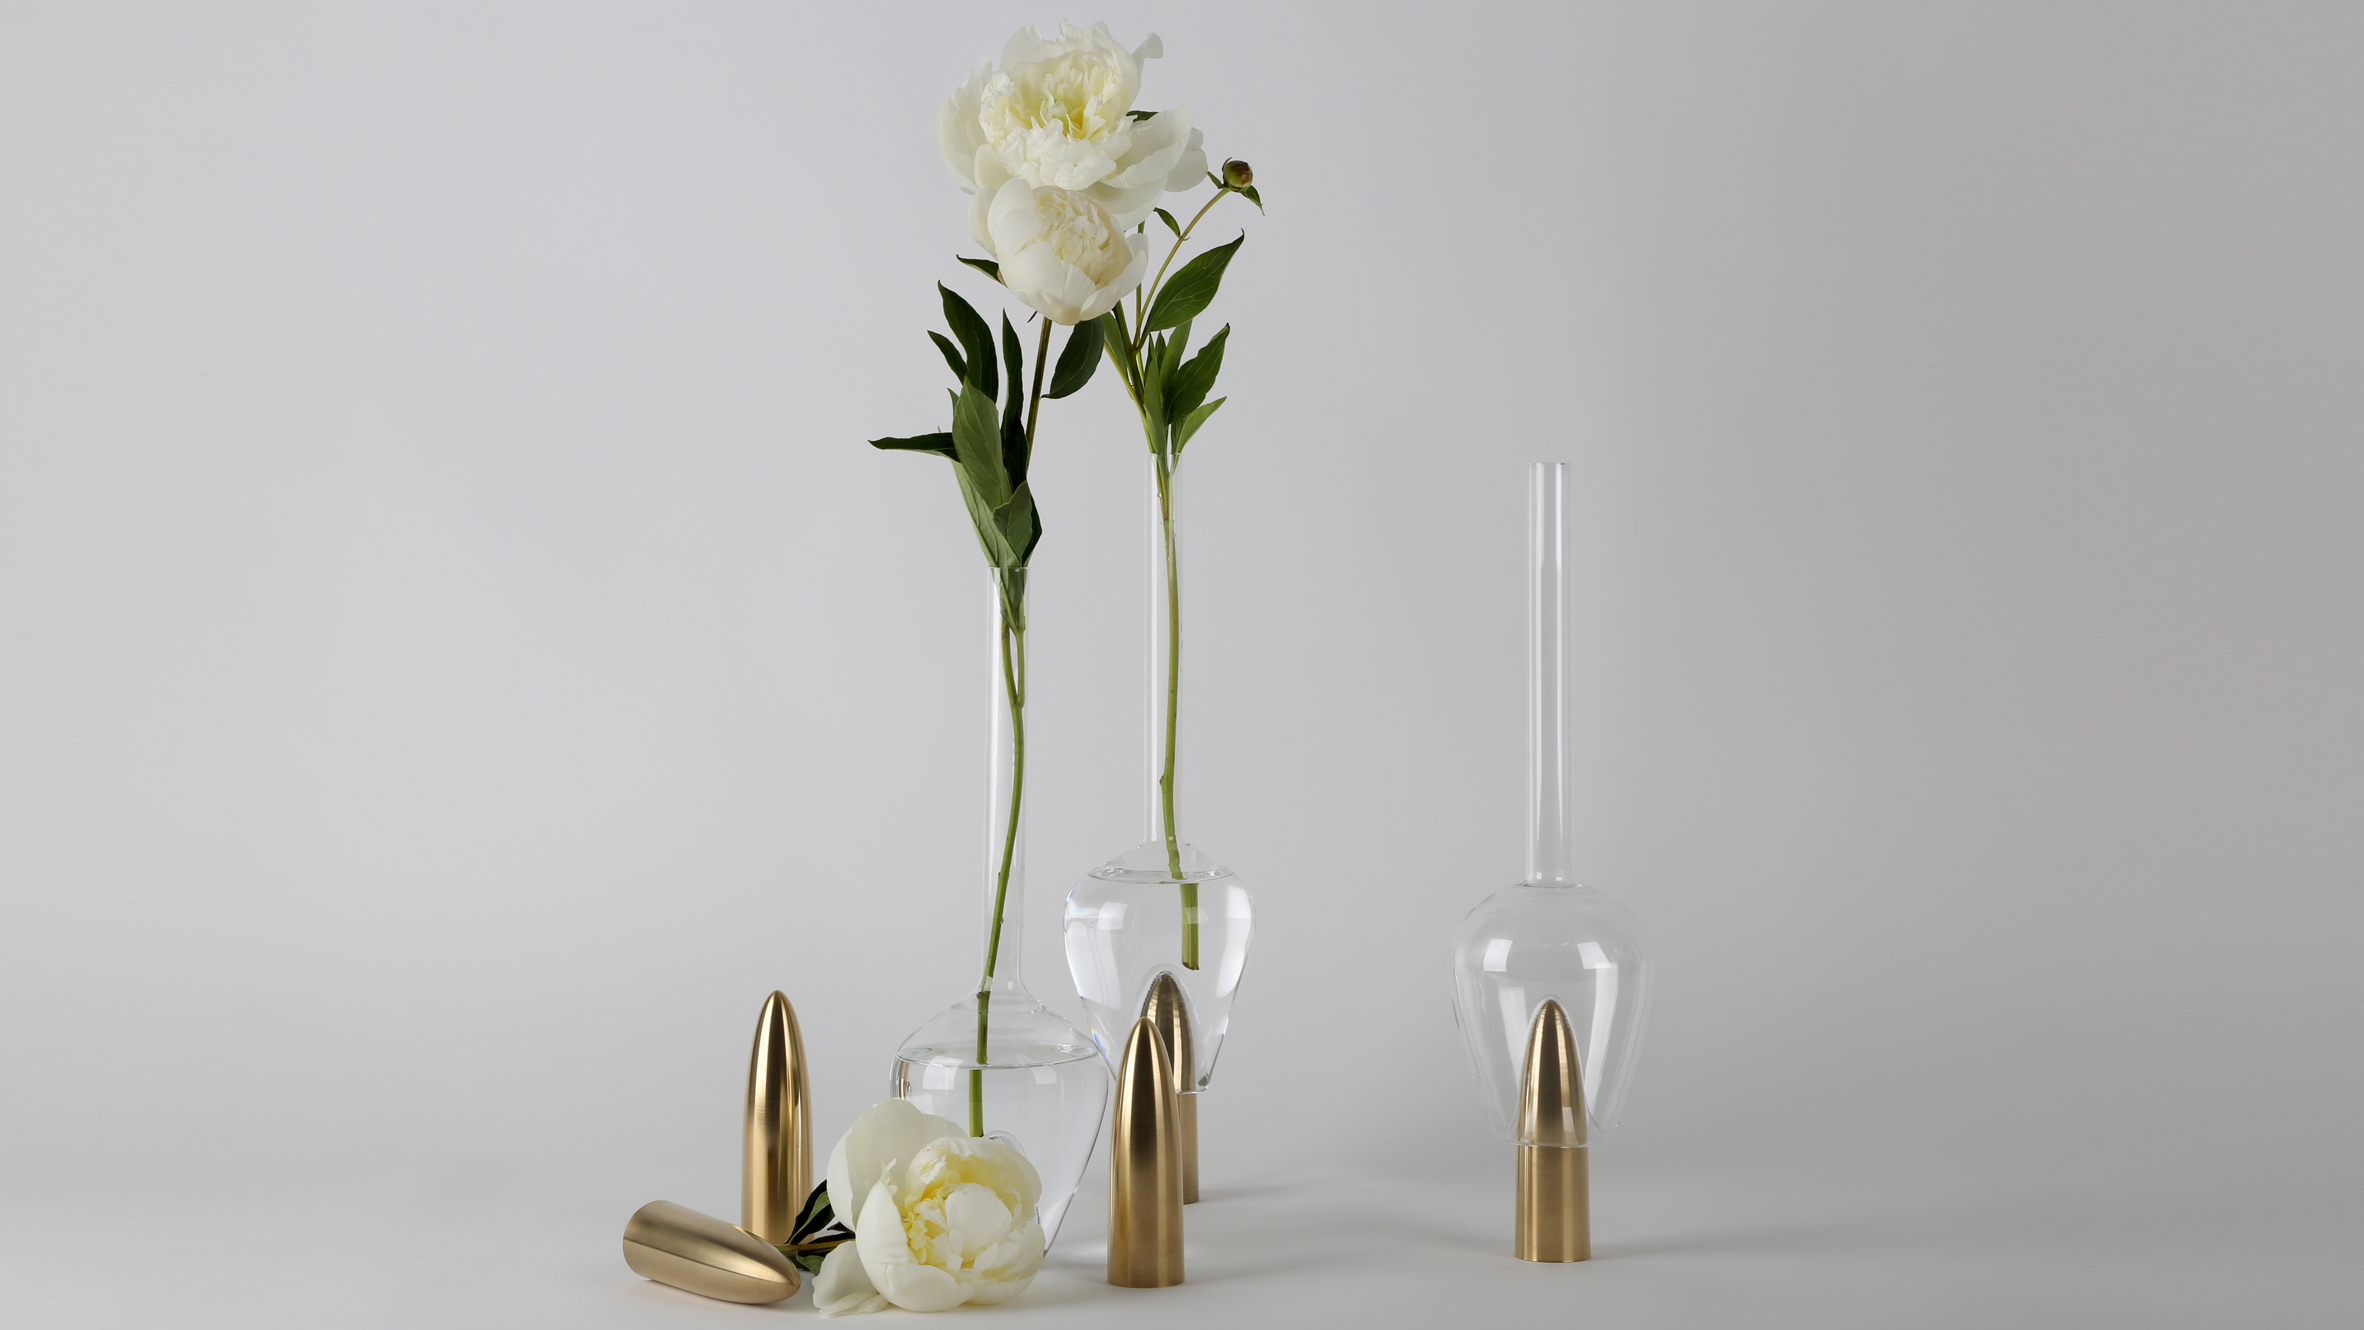 plugged-vessels-richard-yasmine-design-glassware-homeware_dezeen_hero